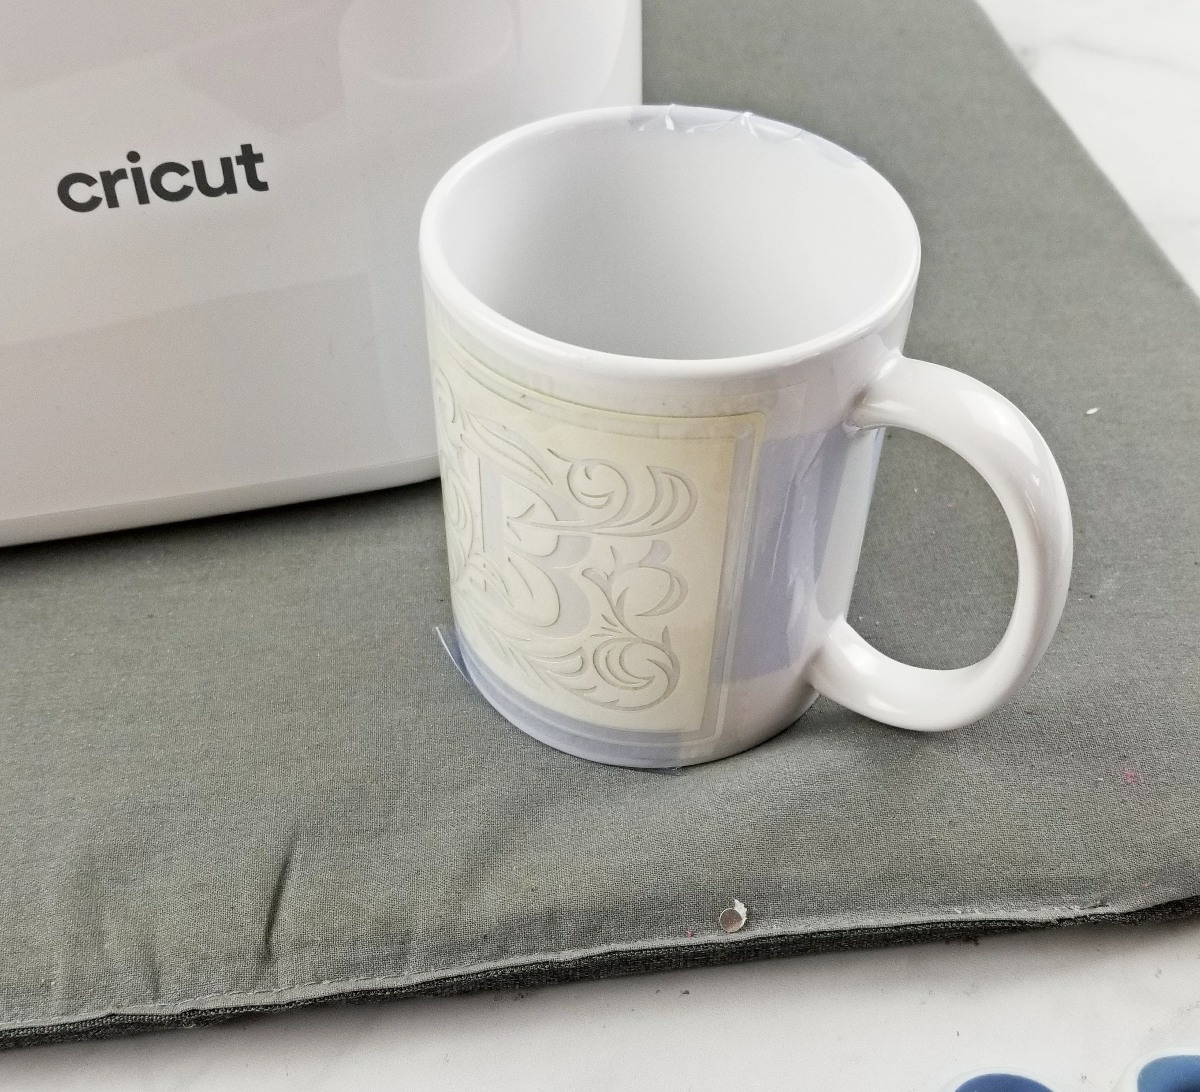 cricket mug press